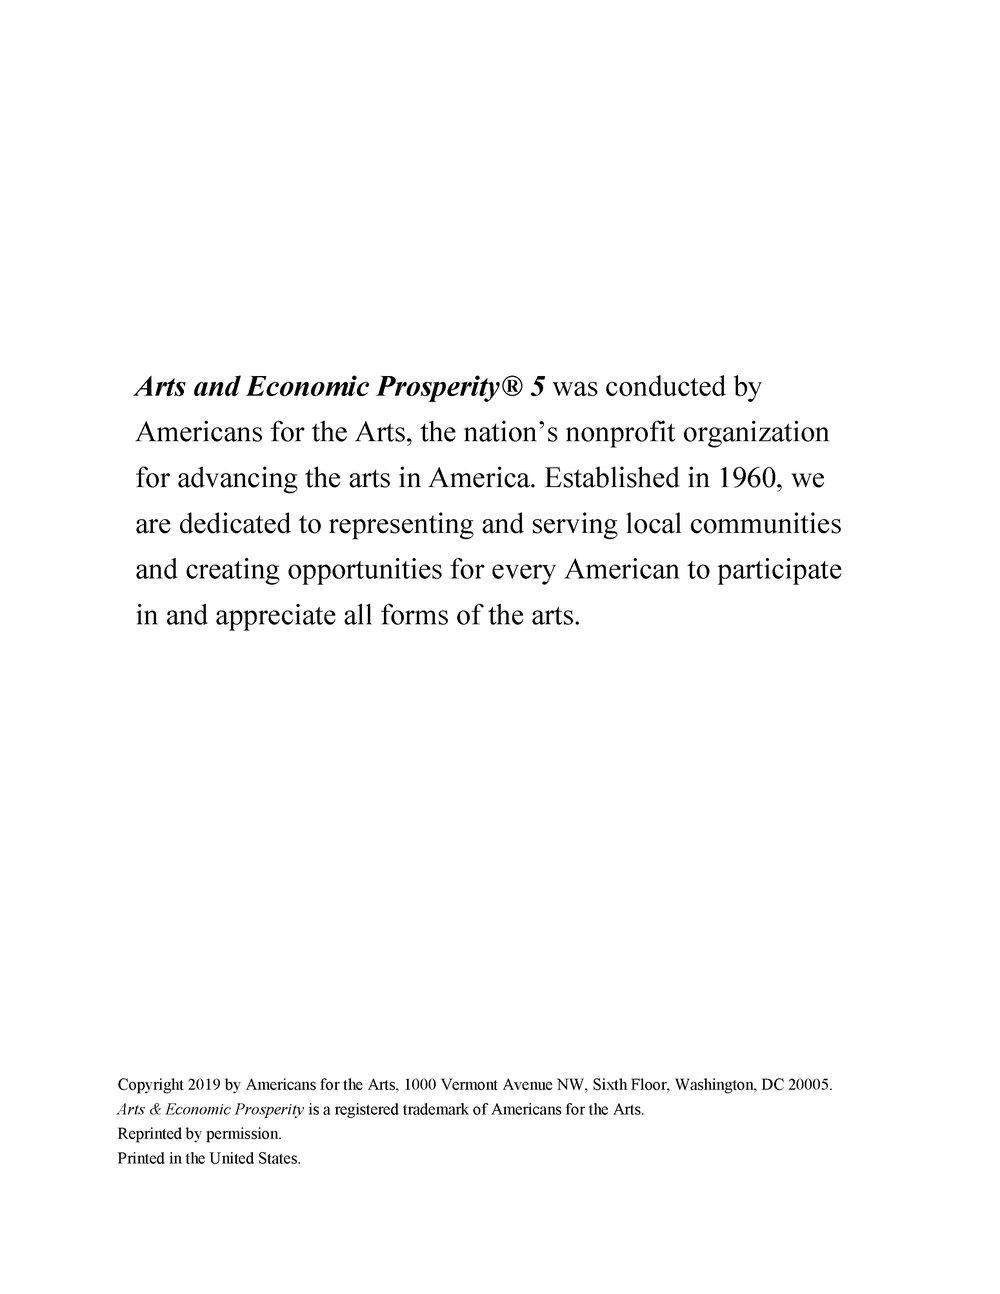 Arts & Economic Prosperity in Nevada County_Page_02.jpg